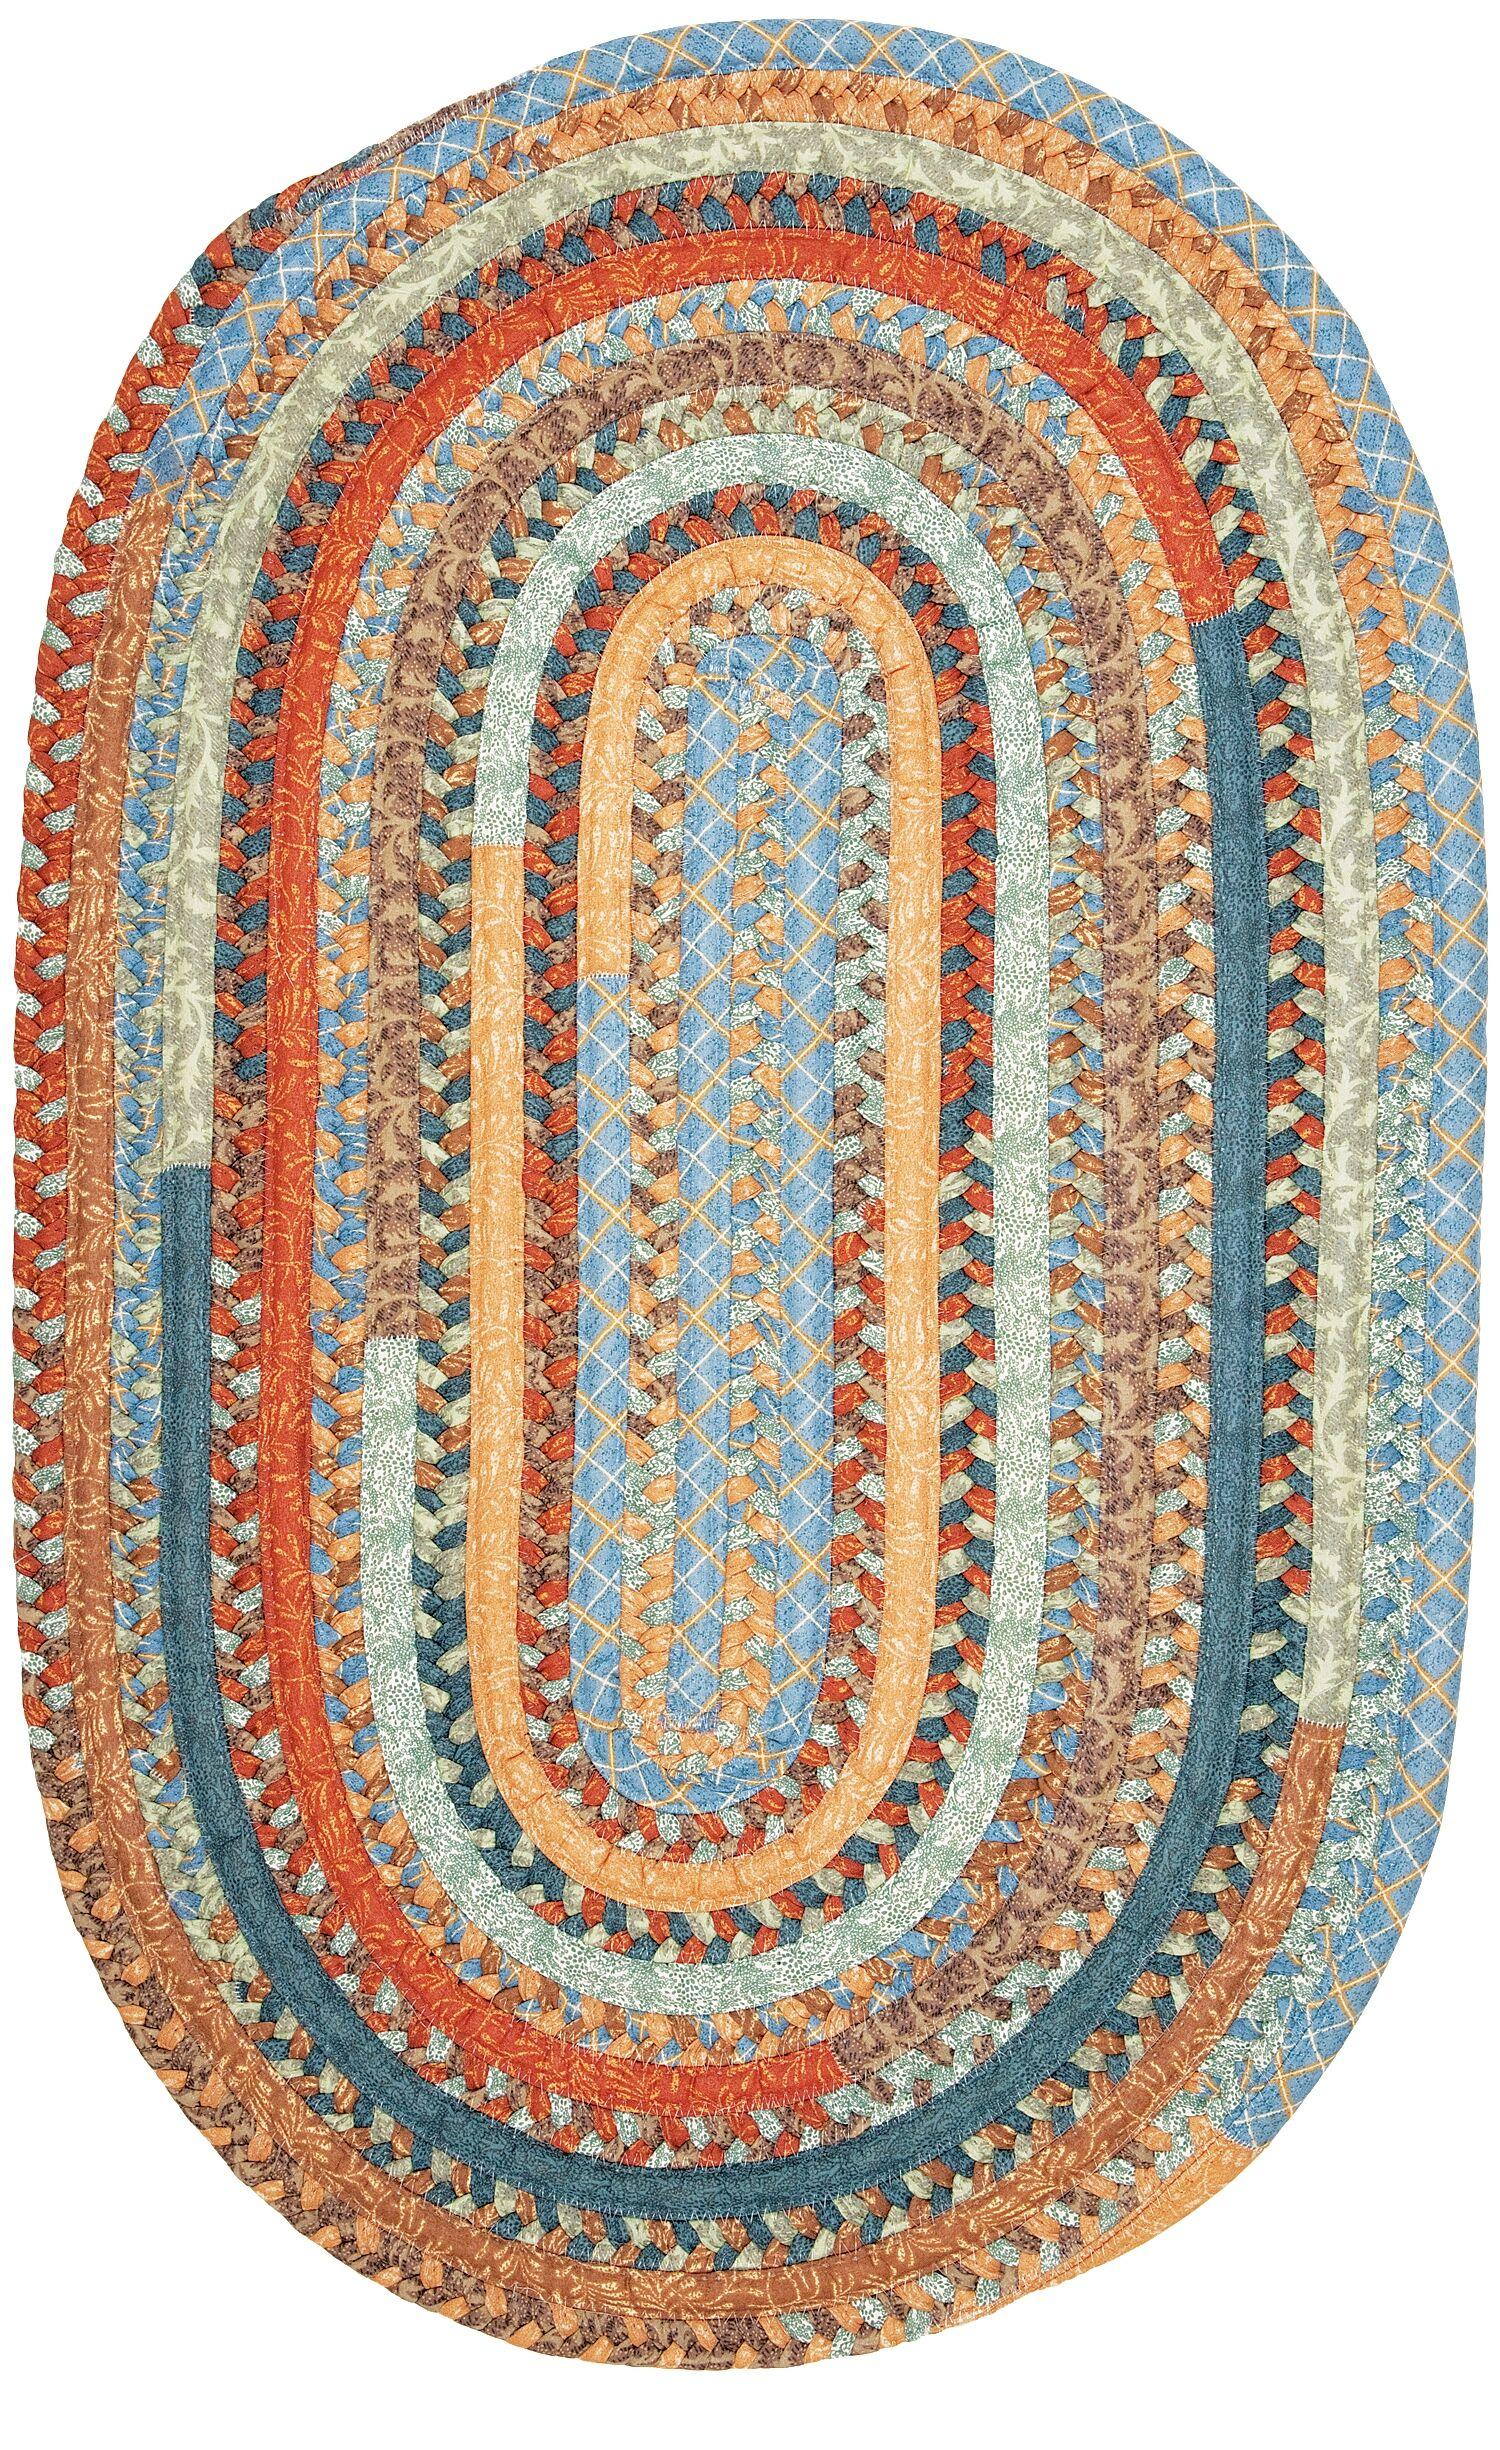 Surette Vintage Blue Multi Kitchen Area Rug Rug Size: Round 10'